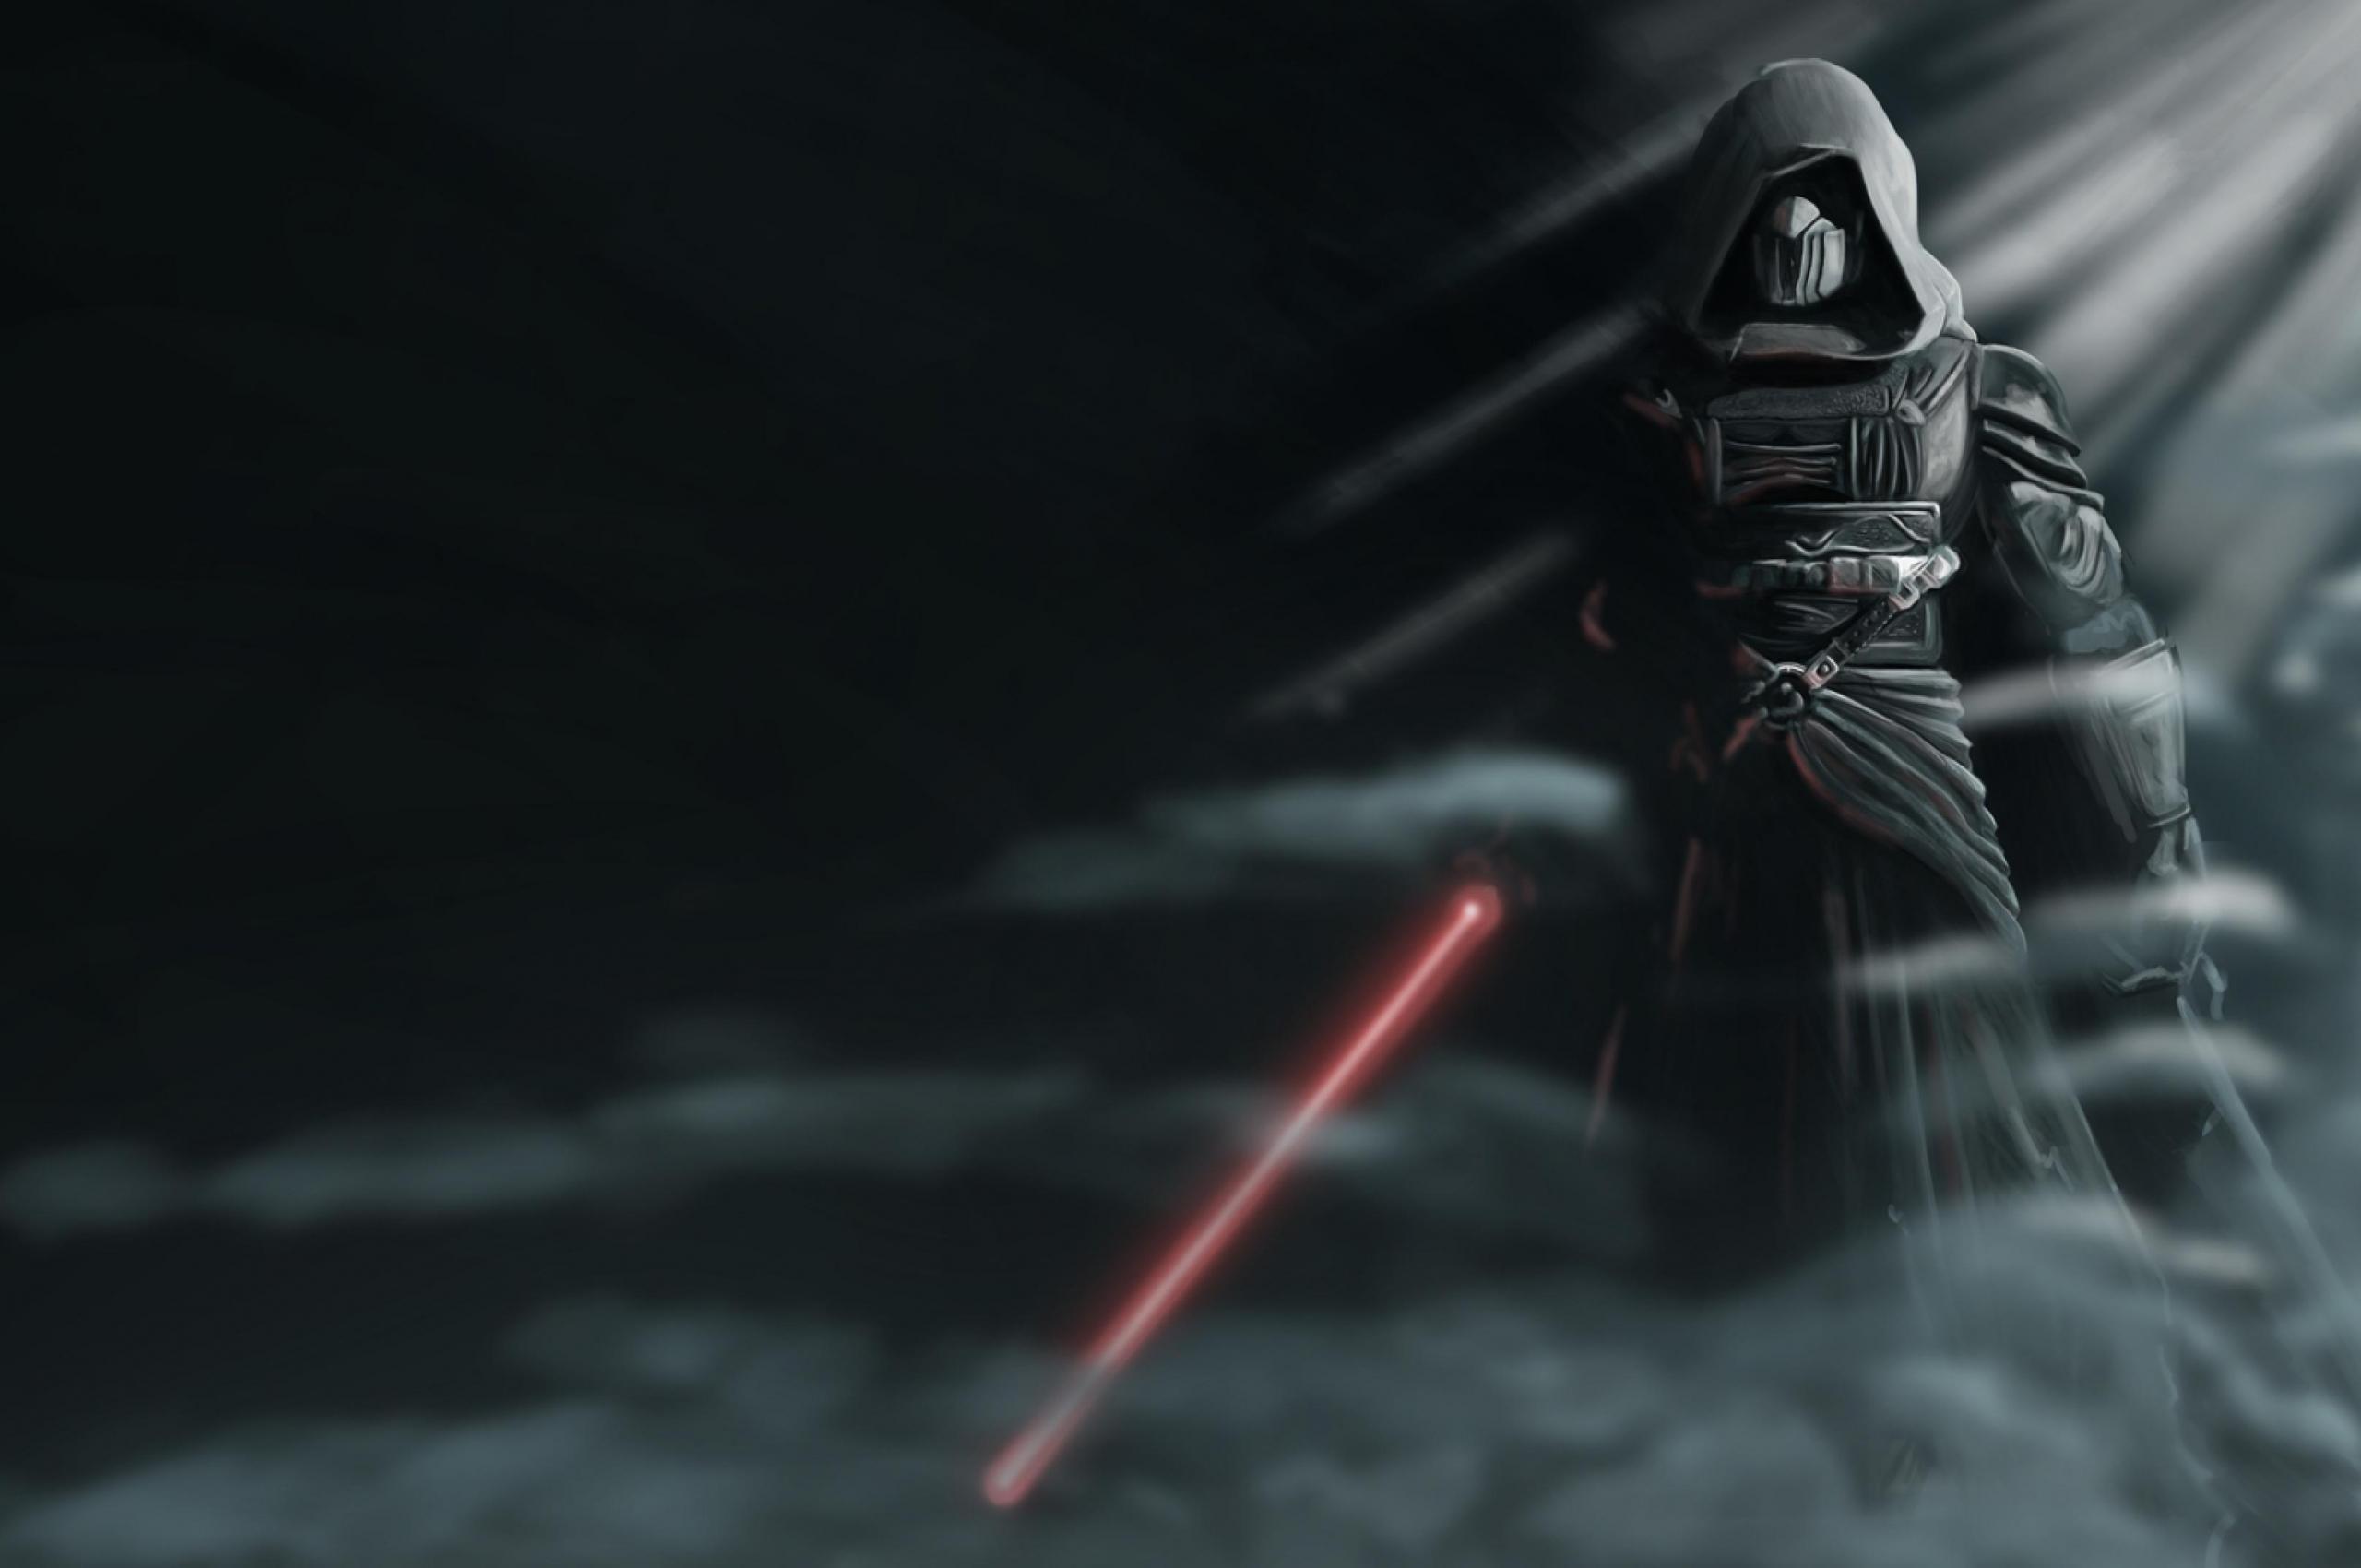 Free Download 42 Qhd Star Wars Wallpapers Star Wars Episode